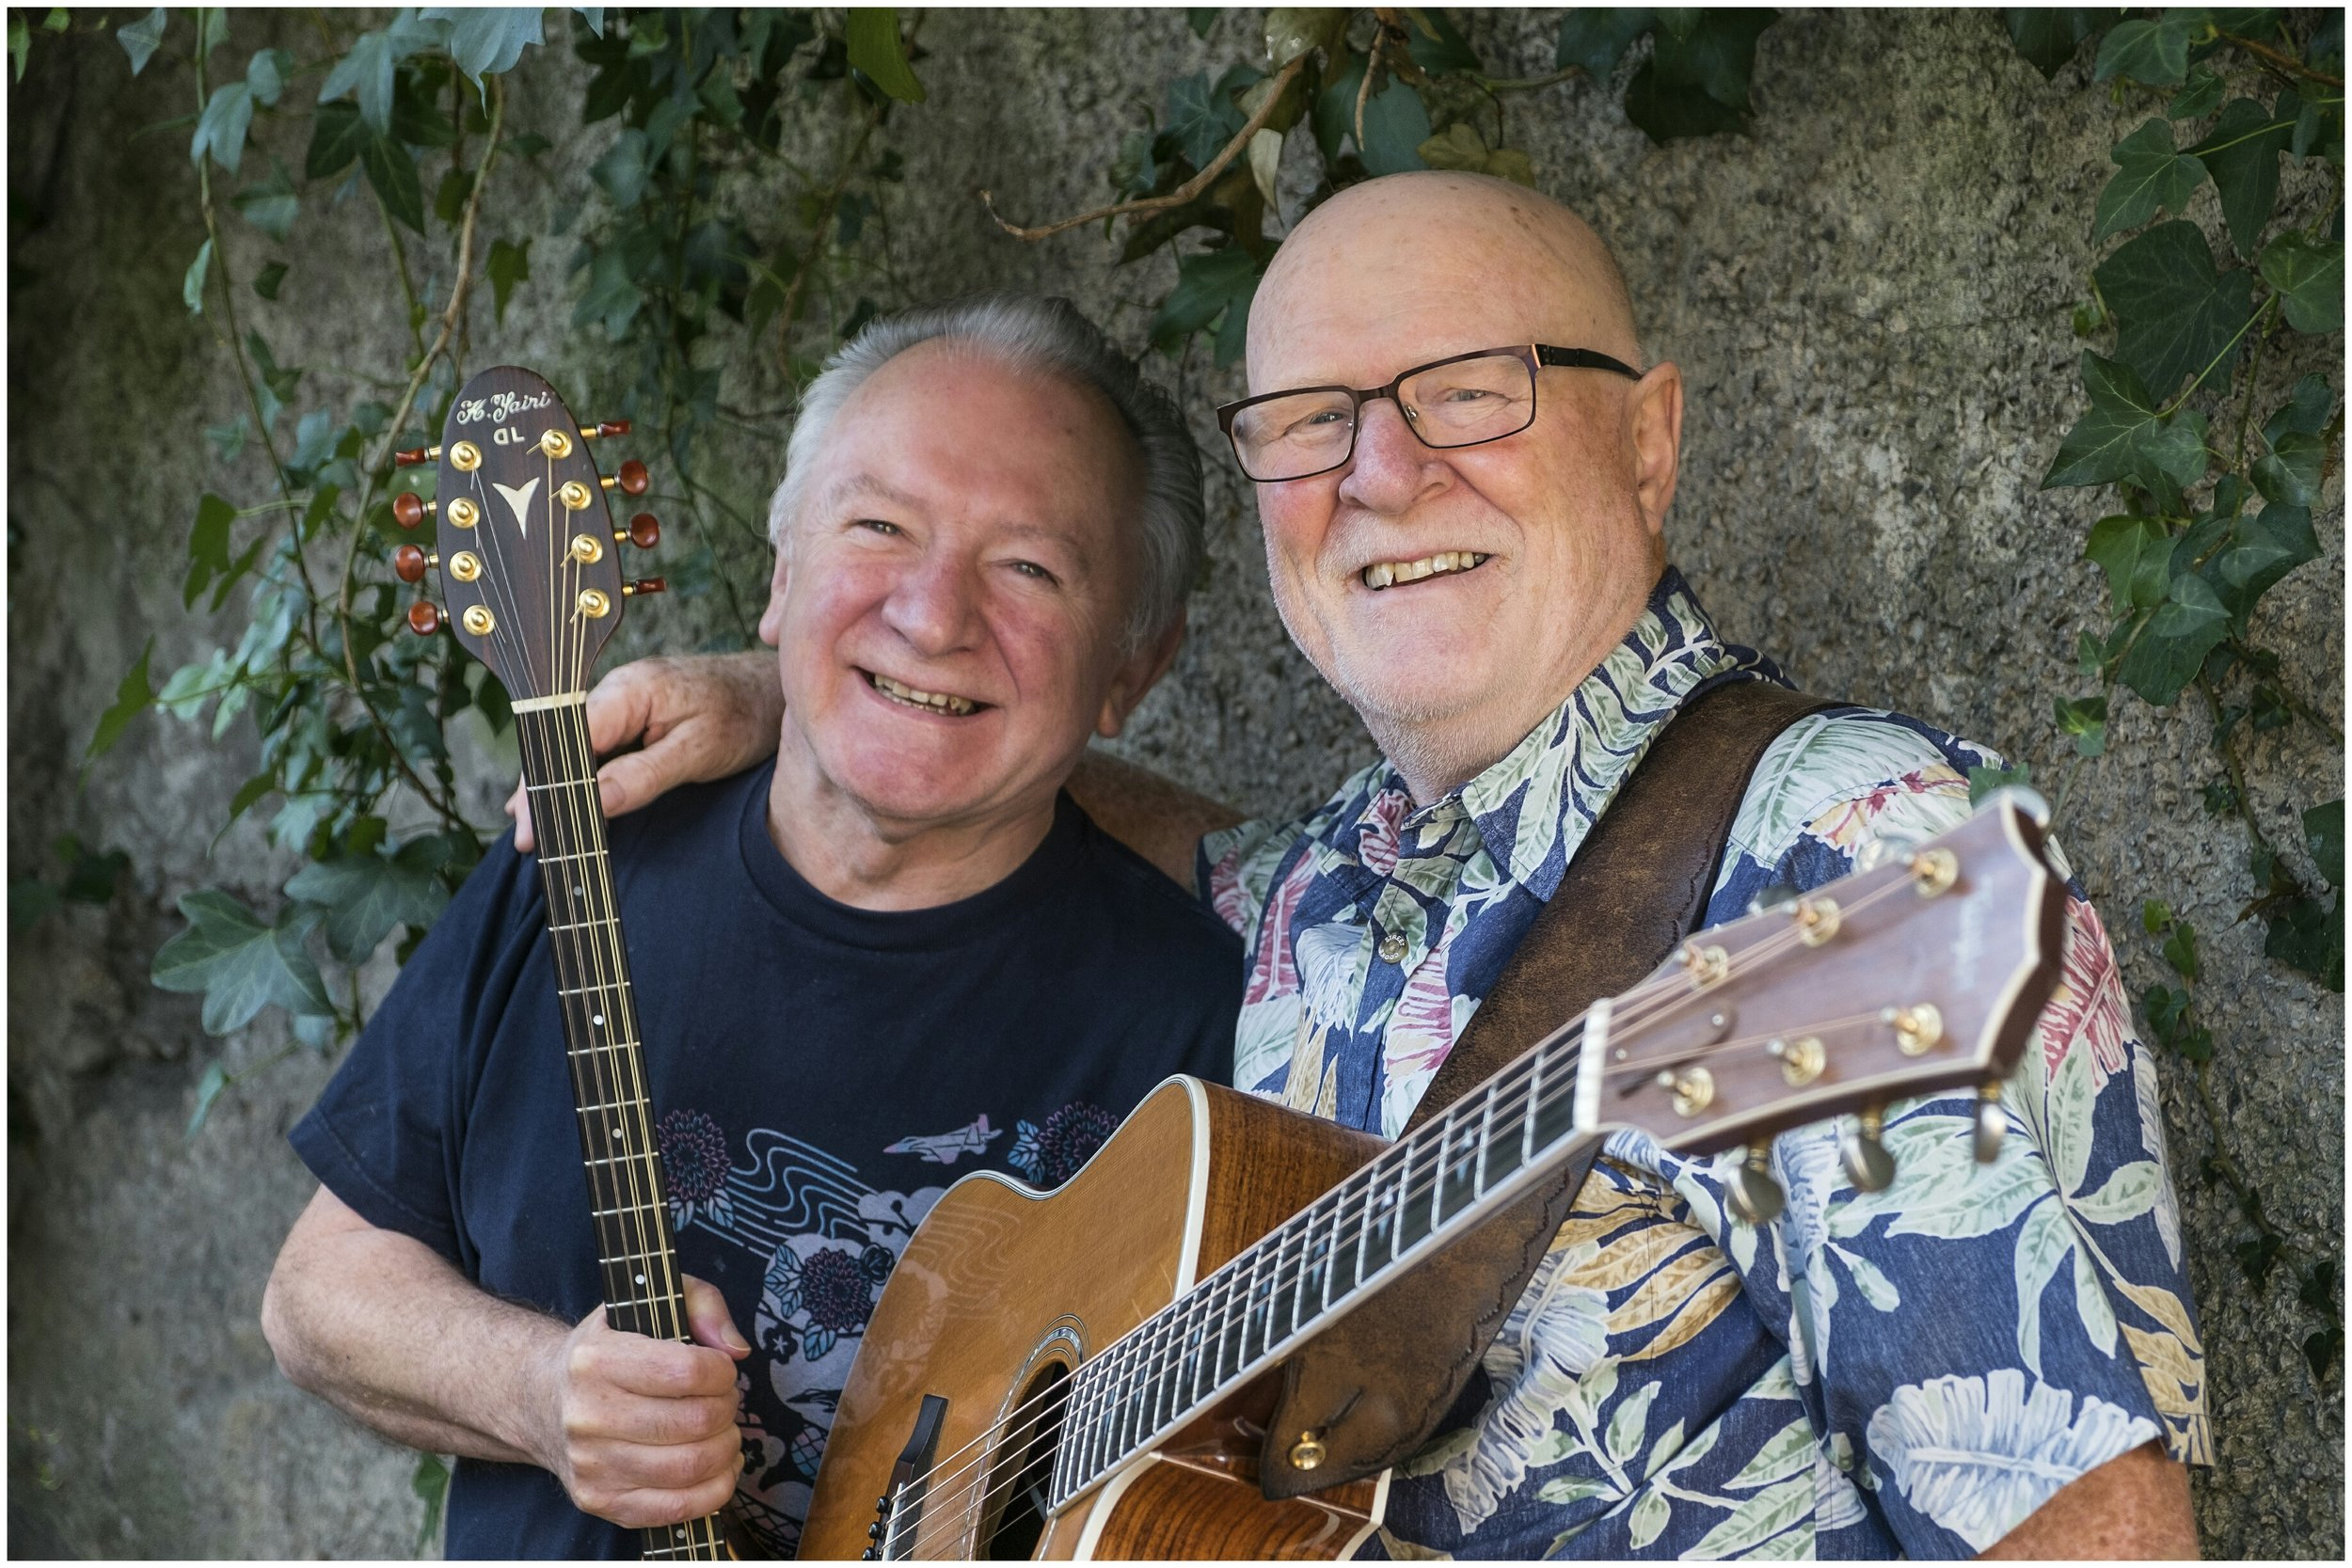 Mick Hanly & Donal Lunny.jpg